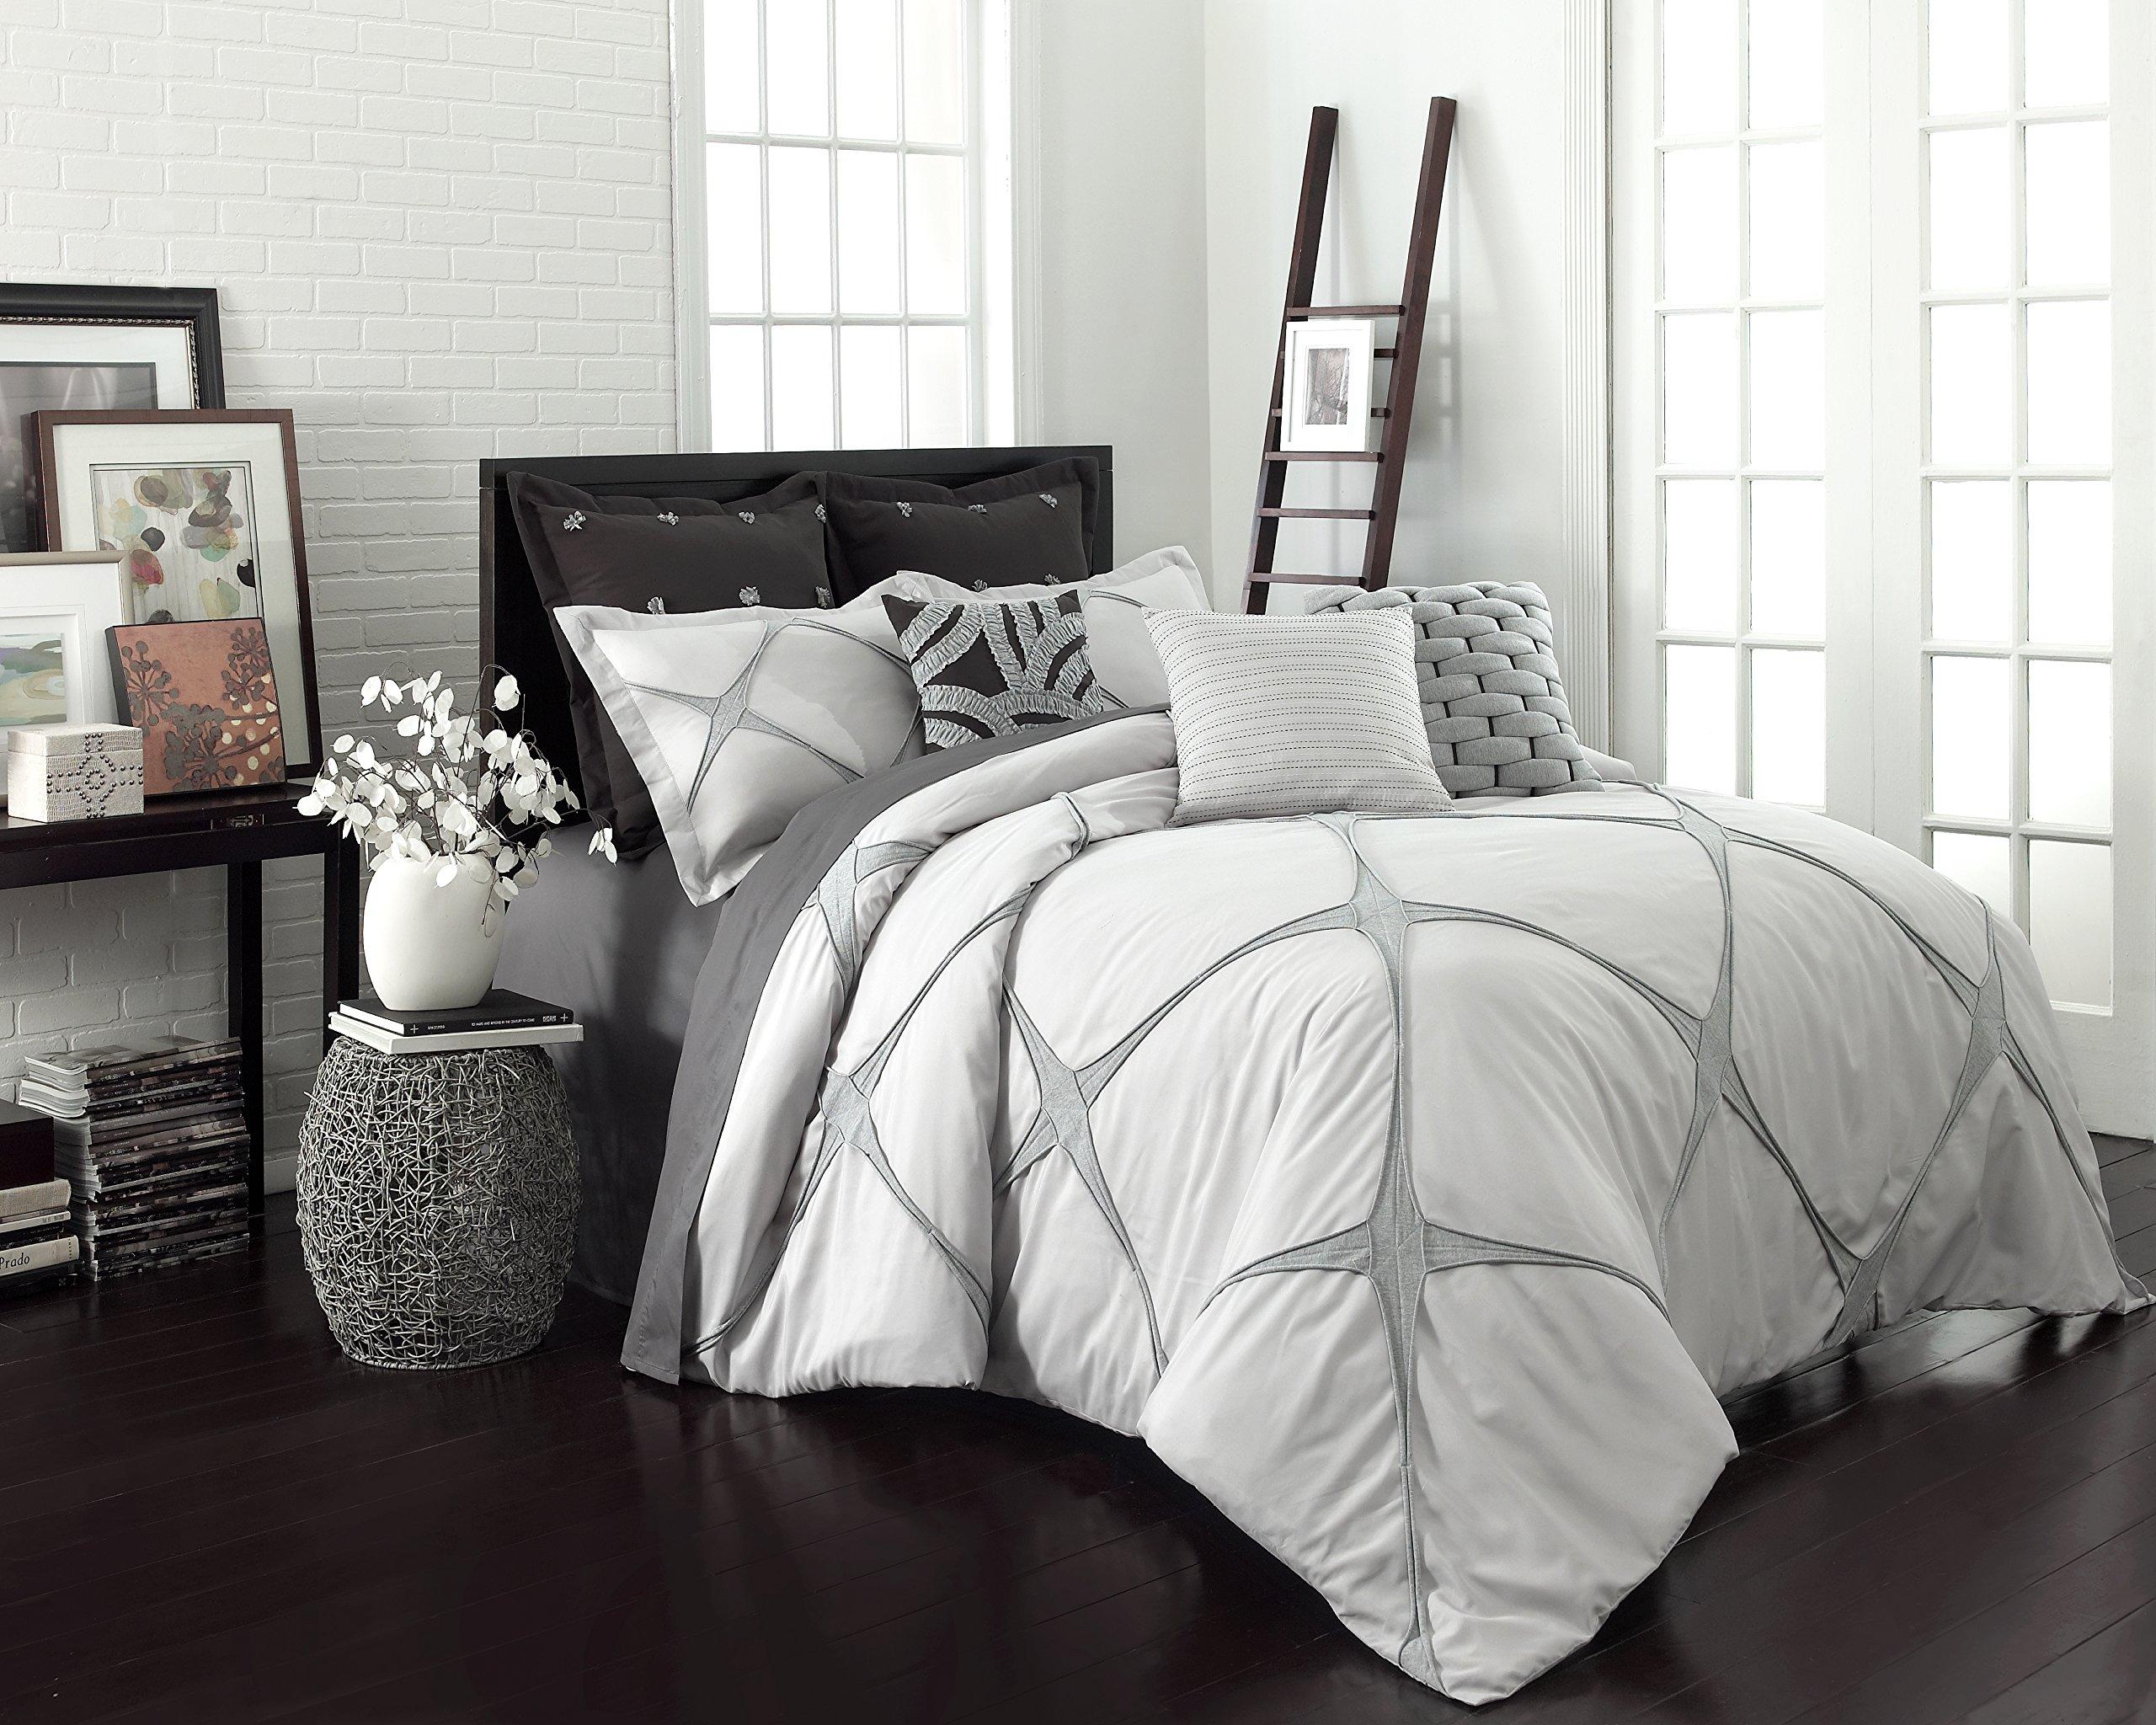 Vue 3 Piece Cersei Fashion Comforter Set, Queen, Grey